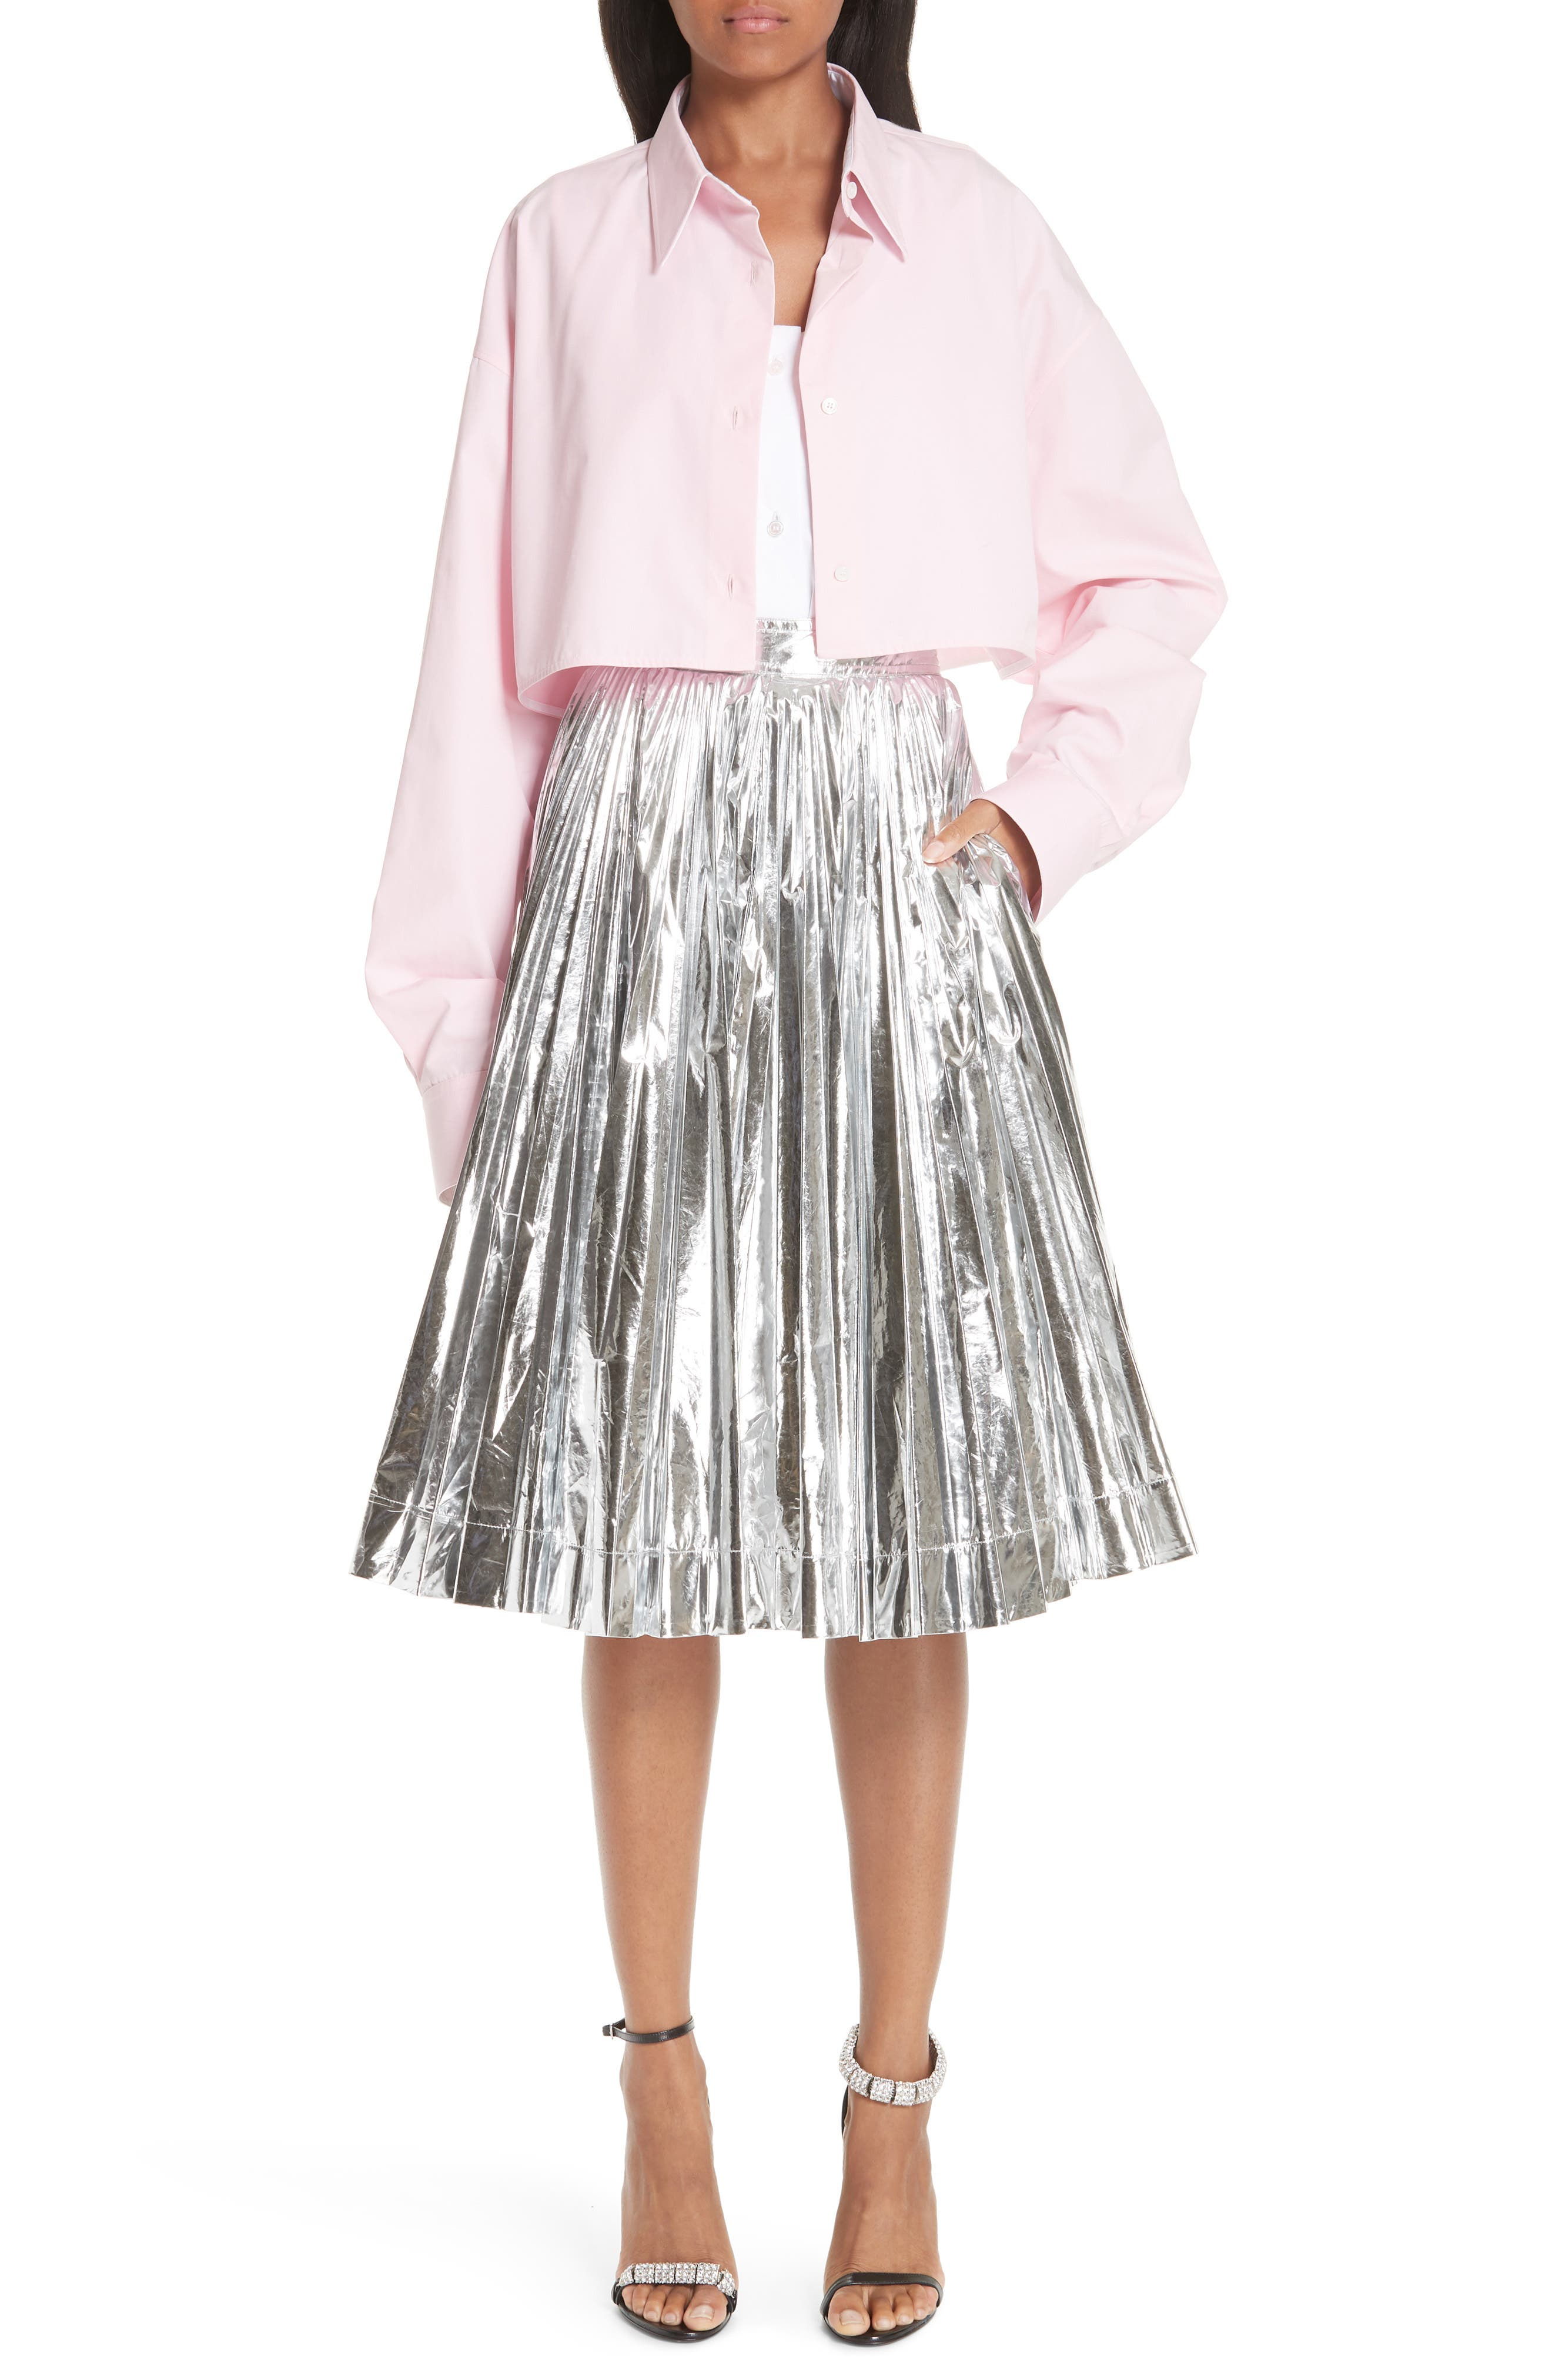 CALVIN KLEIN 205W39NYC, Layered Cotton Poplin Shirt, Alternate thumbnail 2, color, ROSE OPTIC WHITE